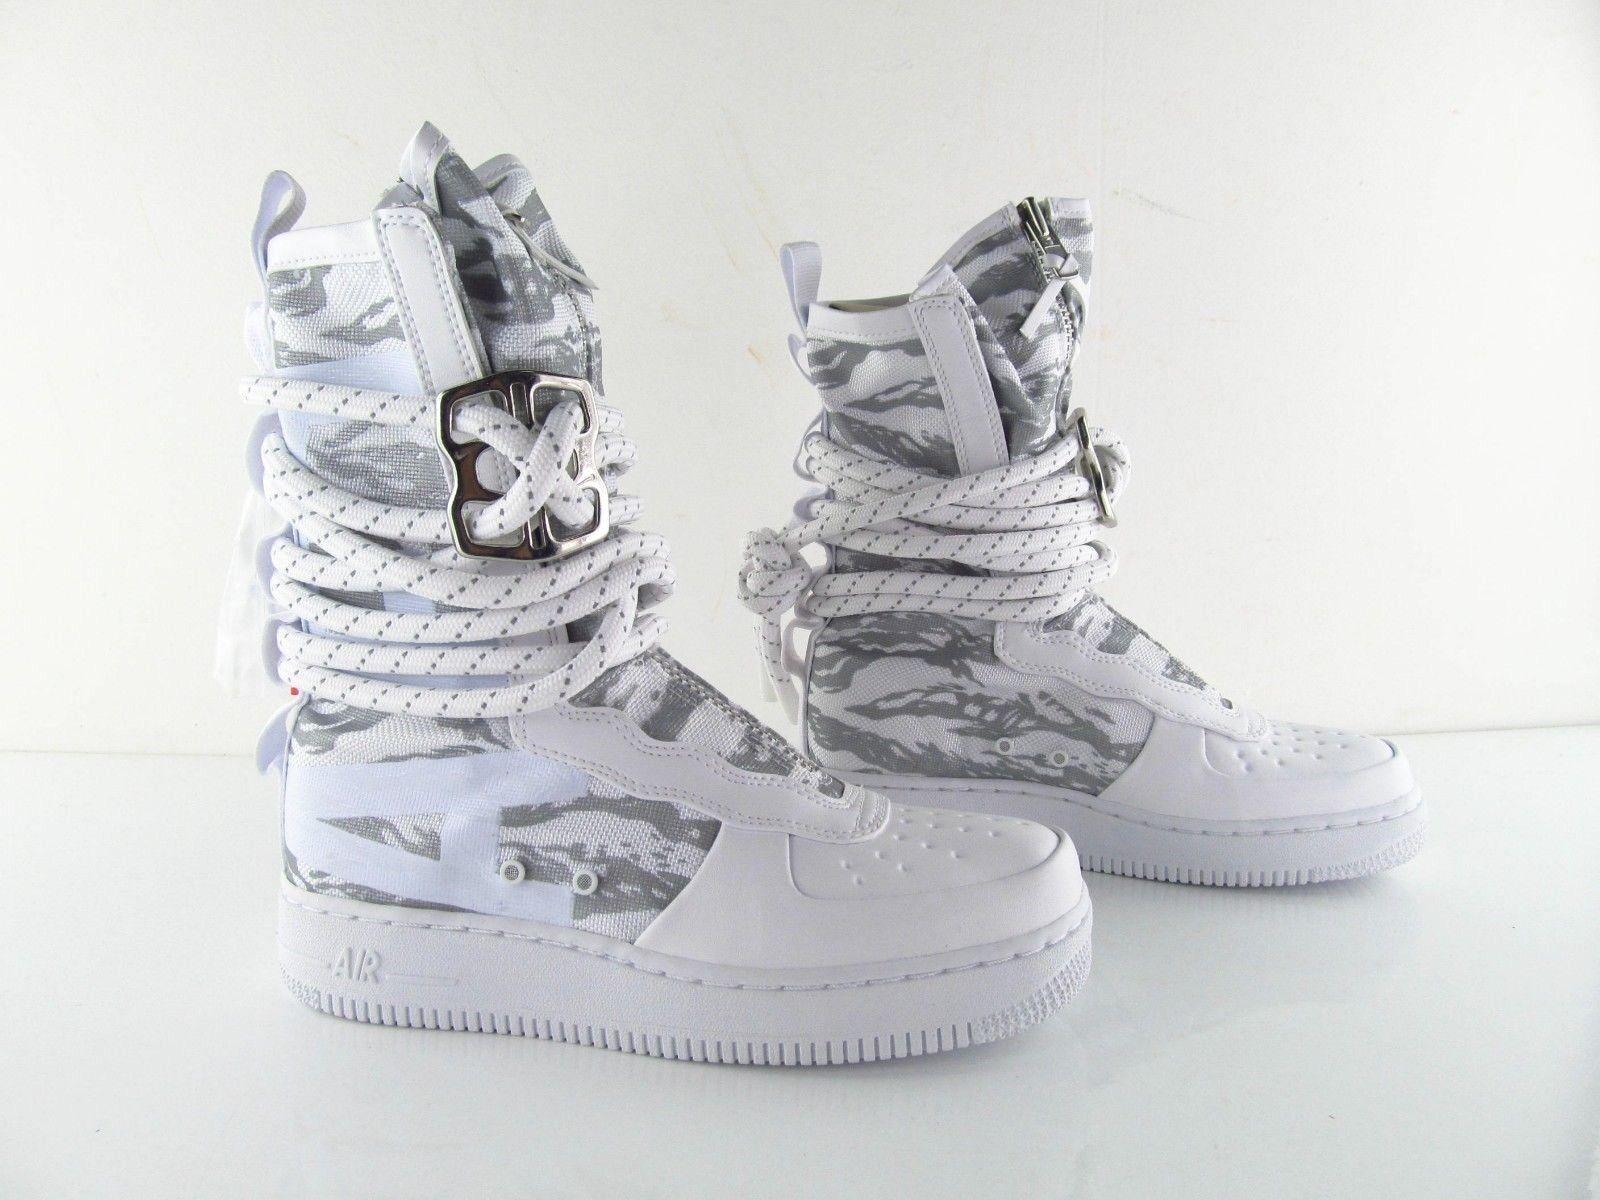 Nike SF Air Force 1 1 1 af1 Hi premium botas blanco zapatilla de deportebota us_6 eur_36.5  entrega rápida